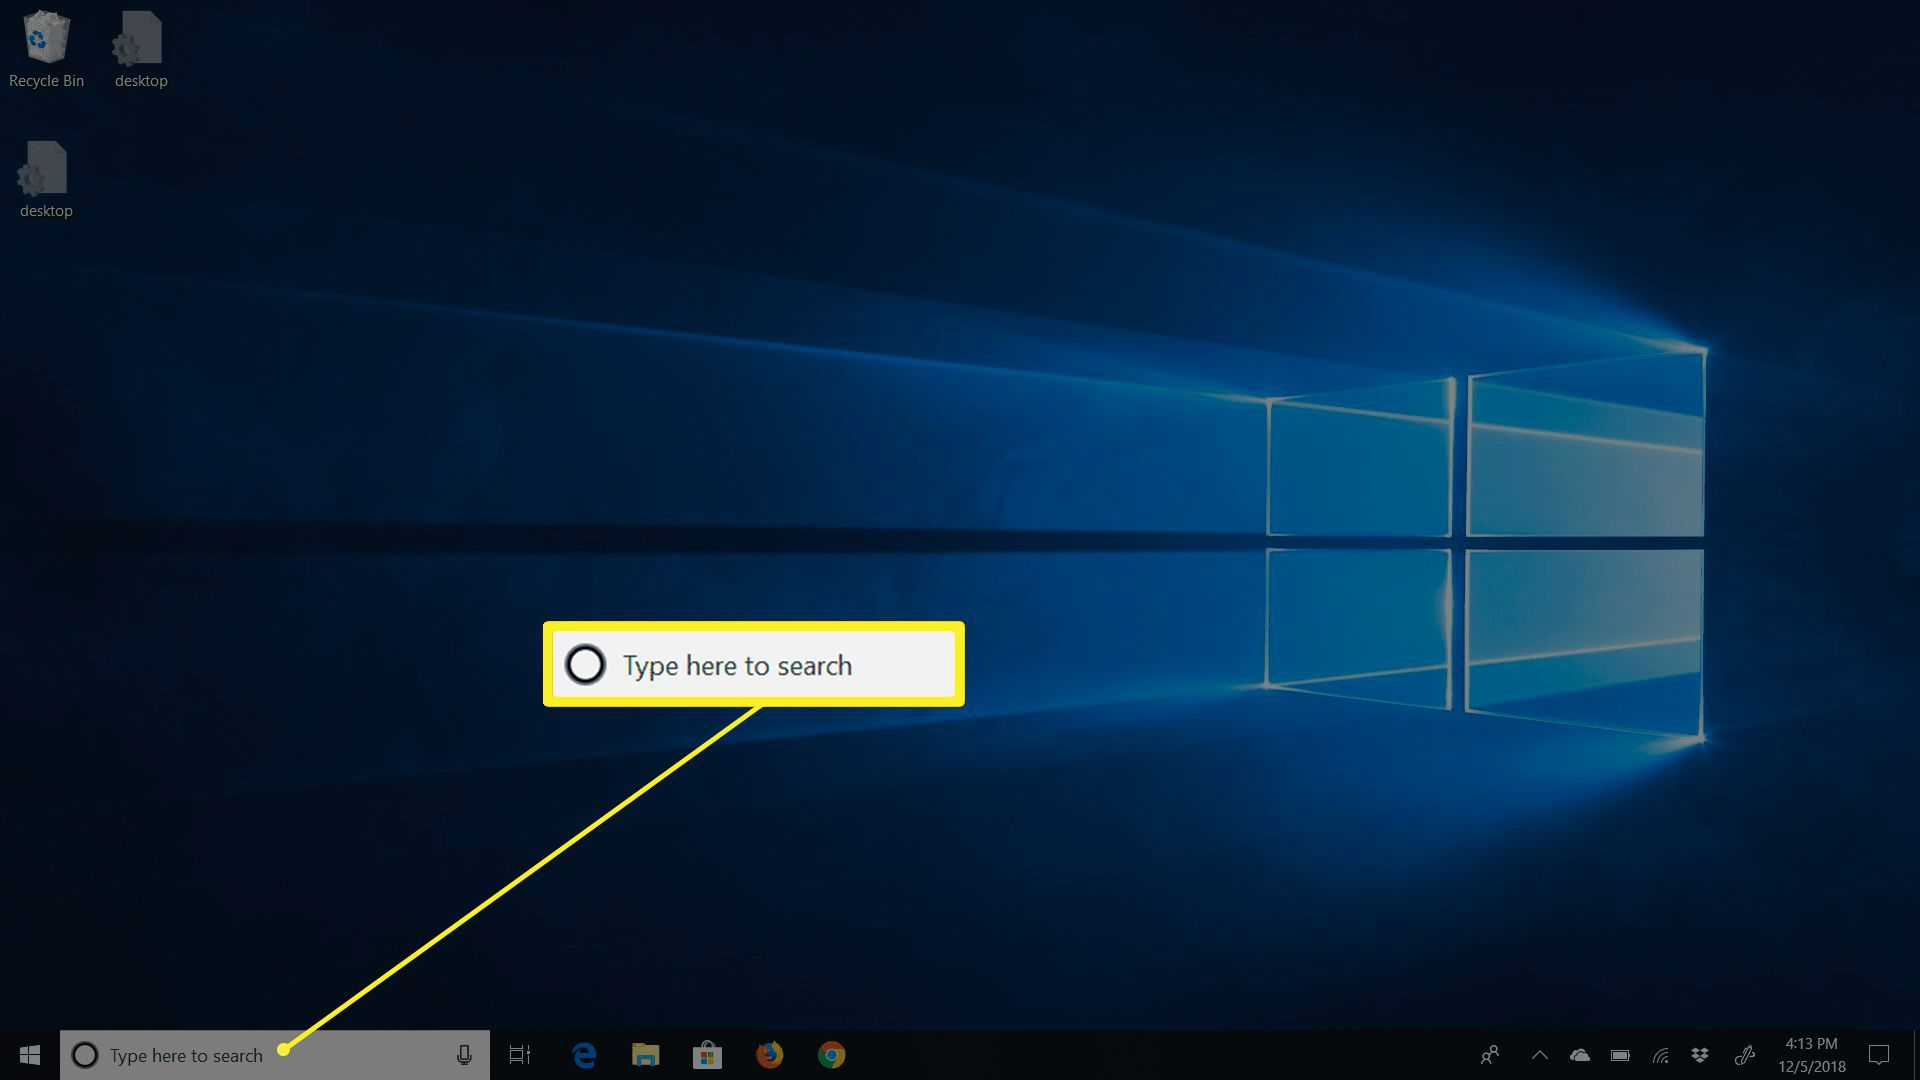 Search bar in Windows 10